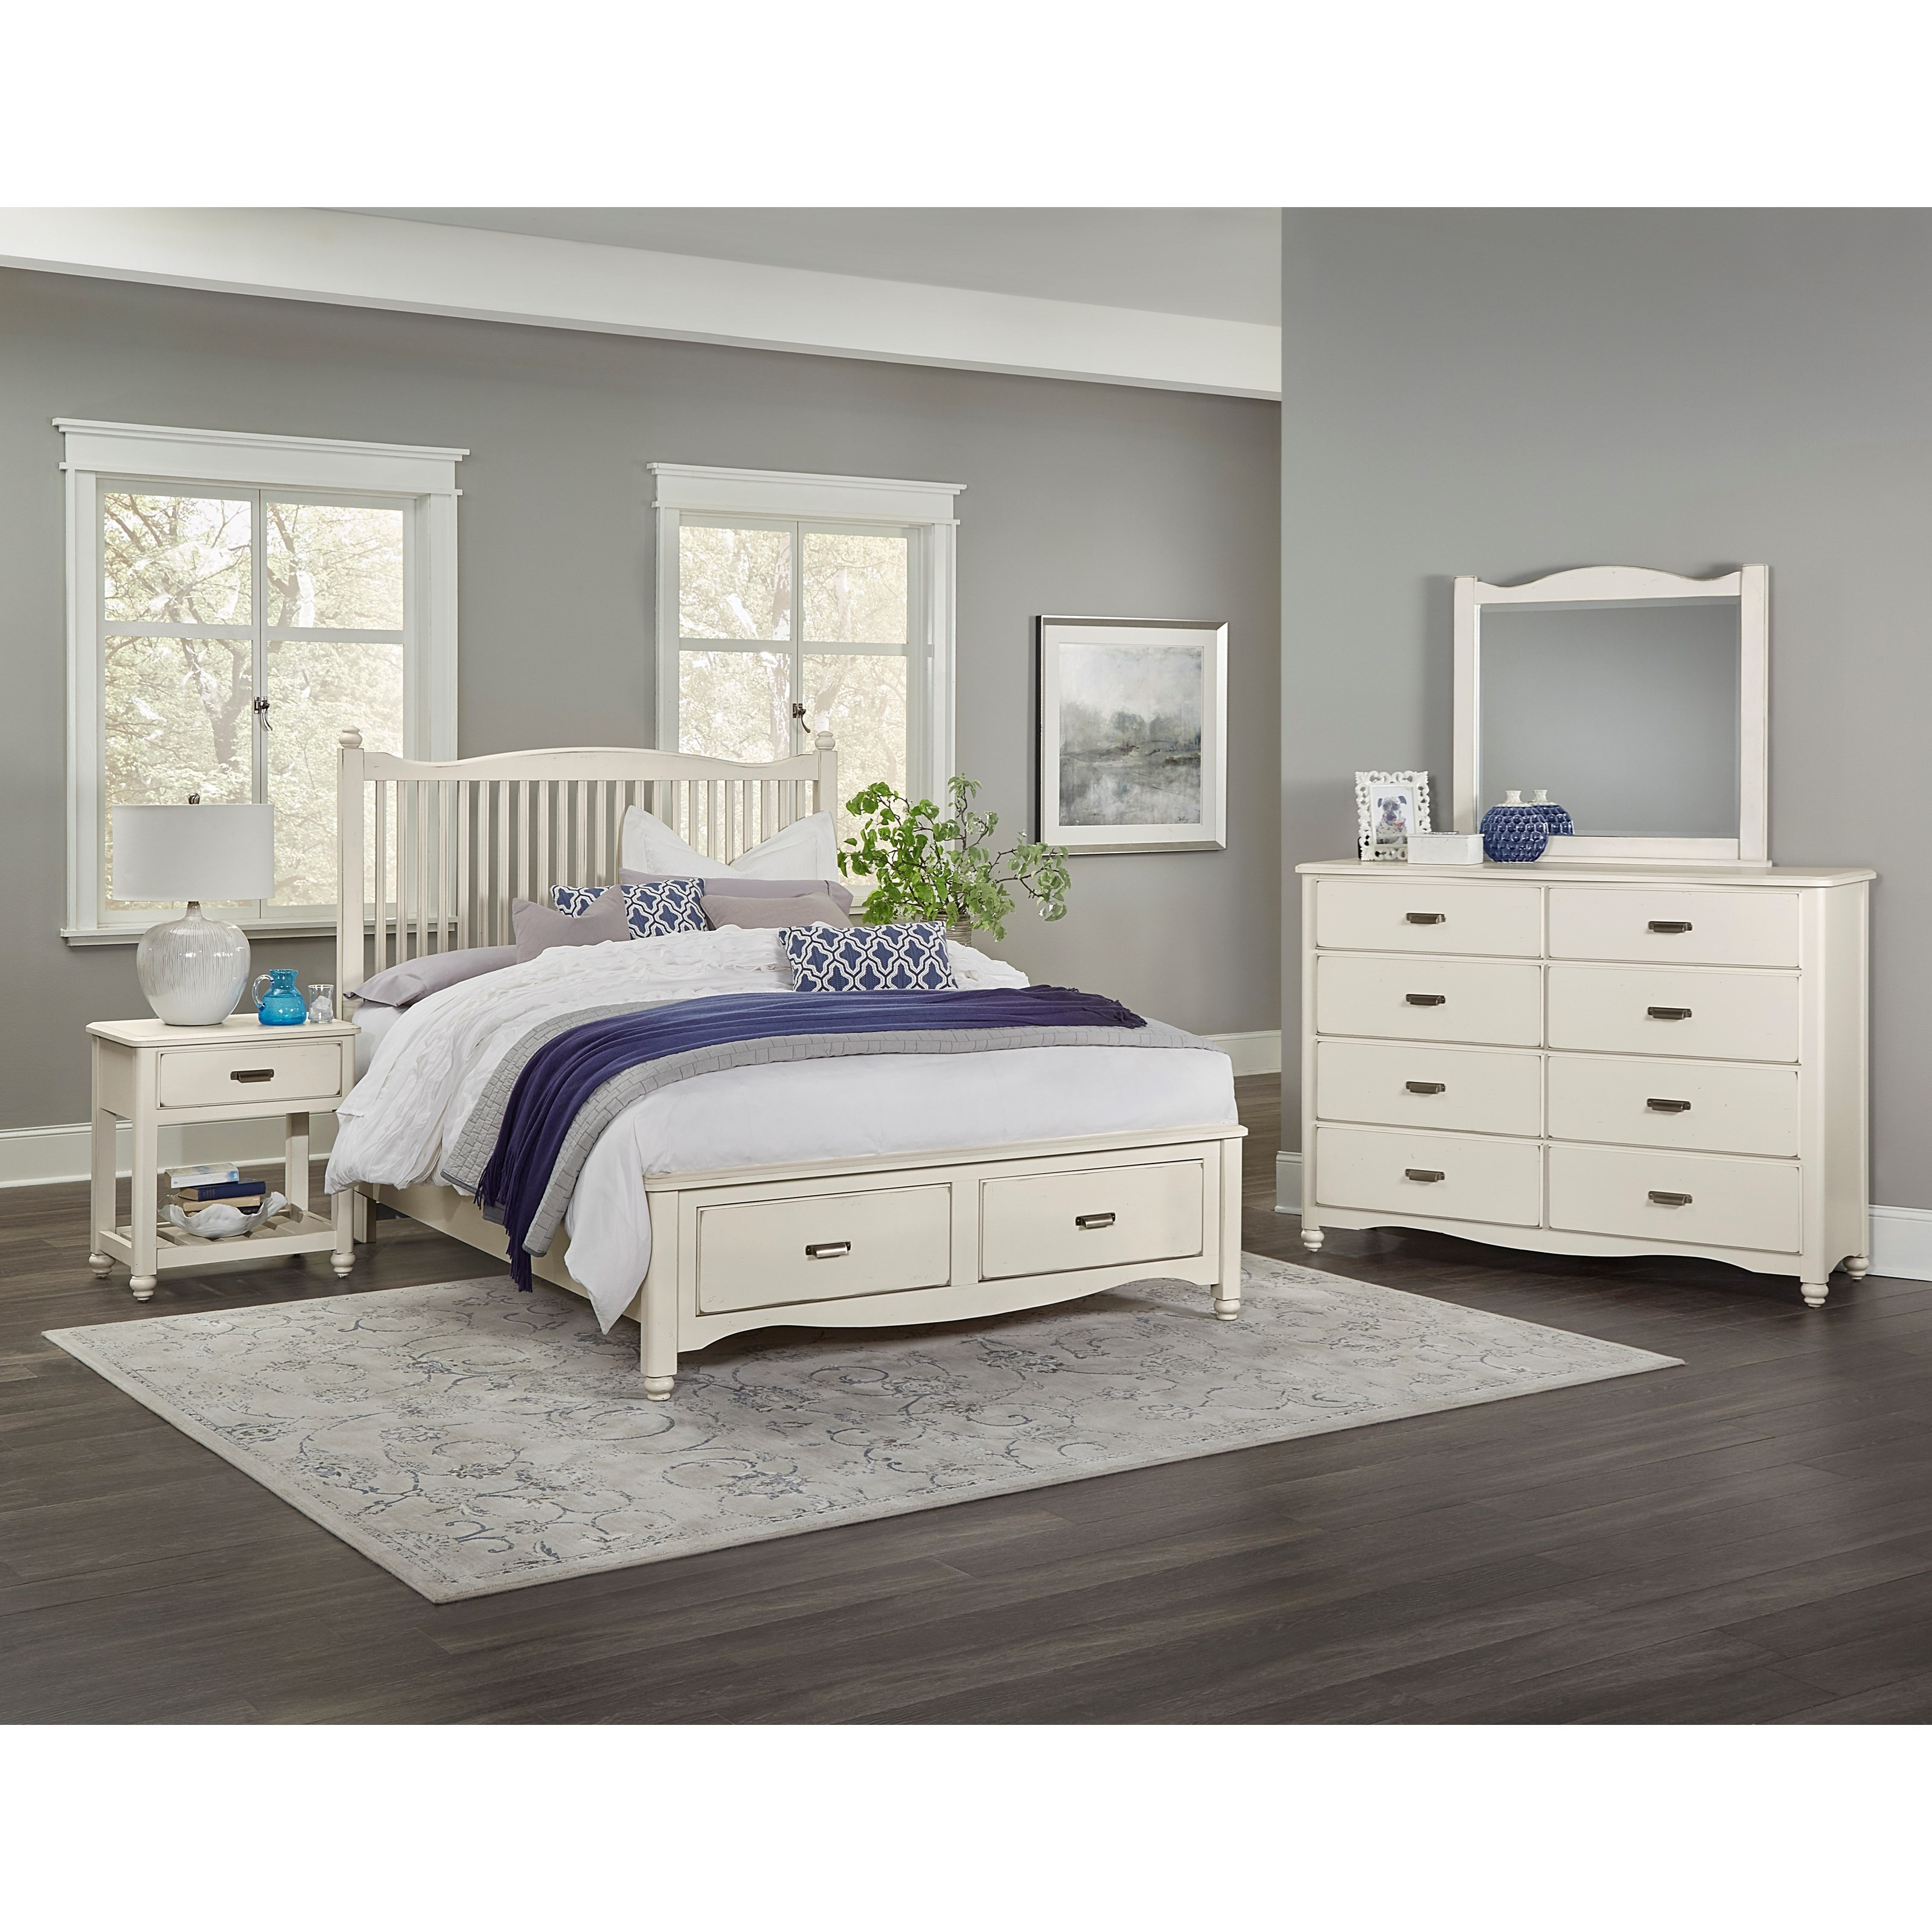 vaughan bassett american maple king bedroom group belfort furniture bedroom groups. Black Bedroom Furniture Sets. Home Design Ideas